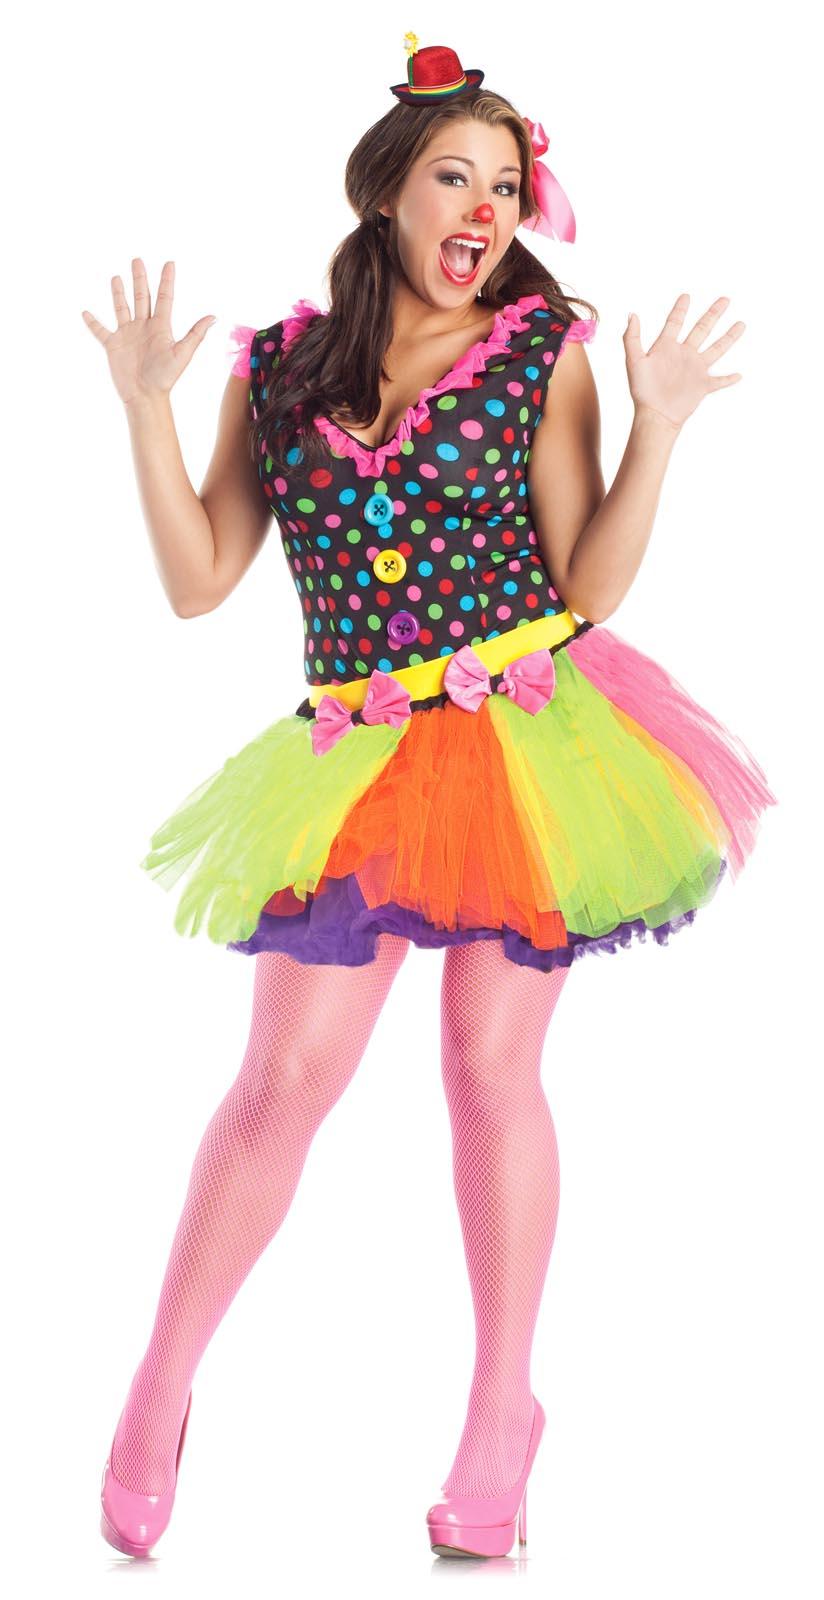 Adult Women Plus Size Cute Circus Clown Costume Dress